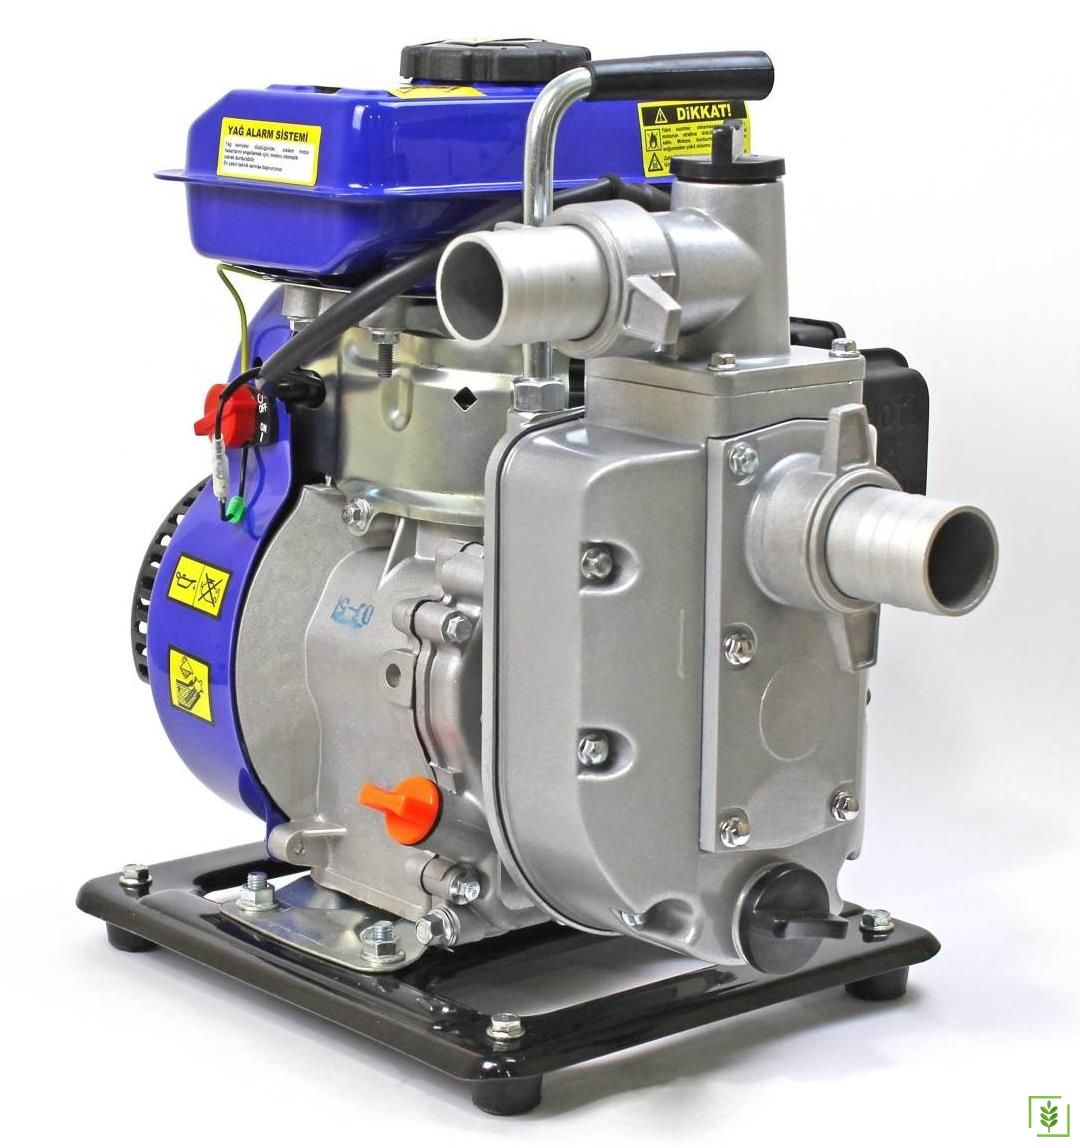 DBK PWP 40-15 Benzinli Su Motoru Motopomp 1.5''